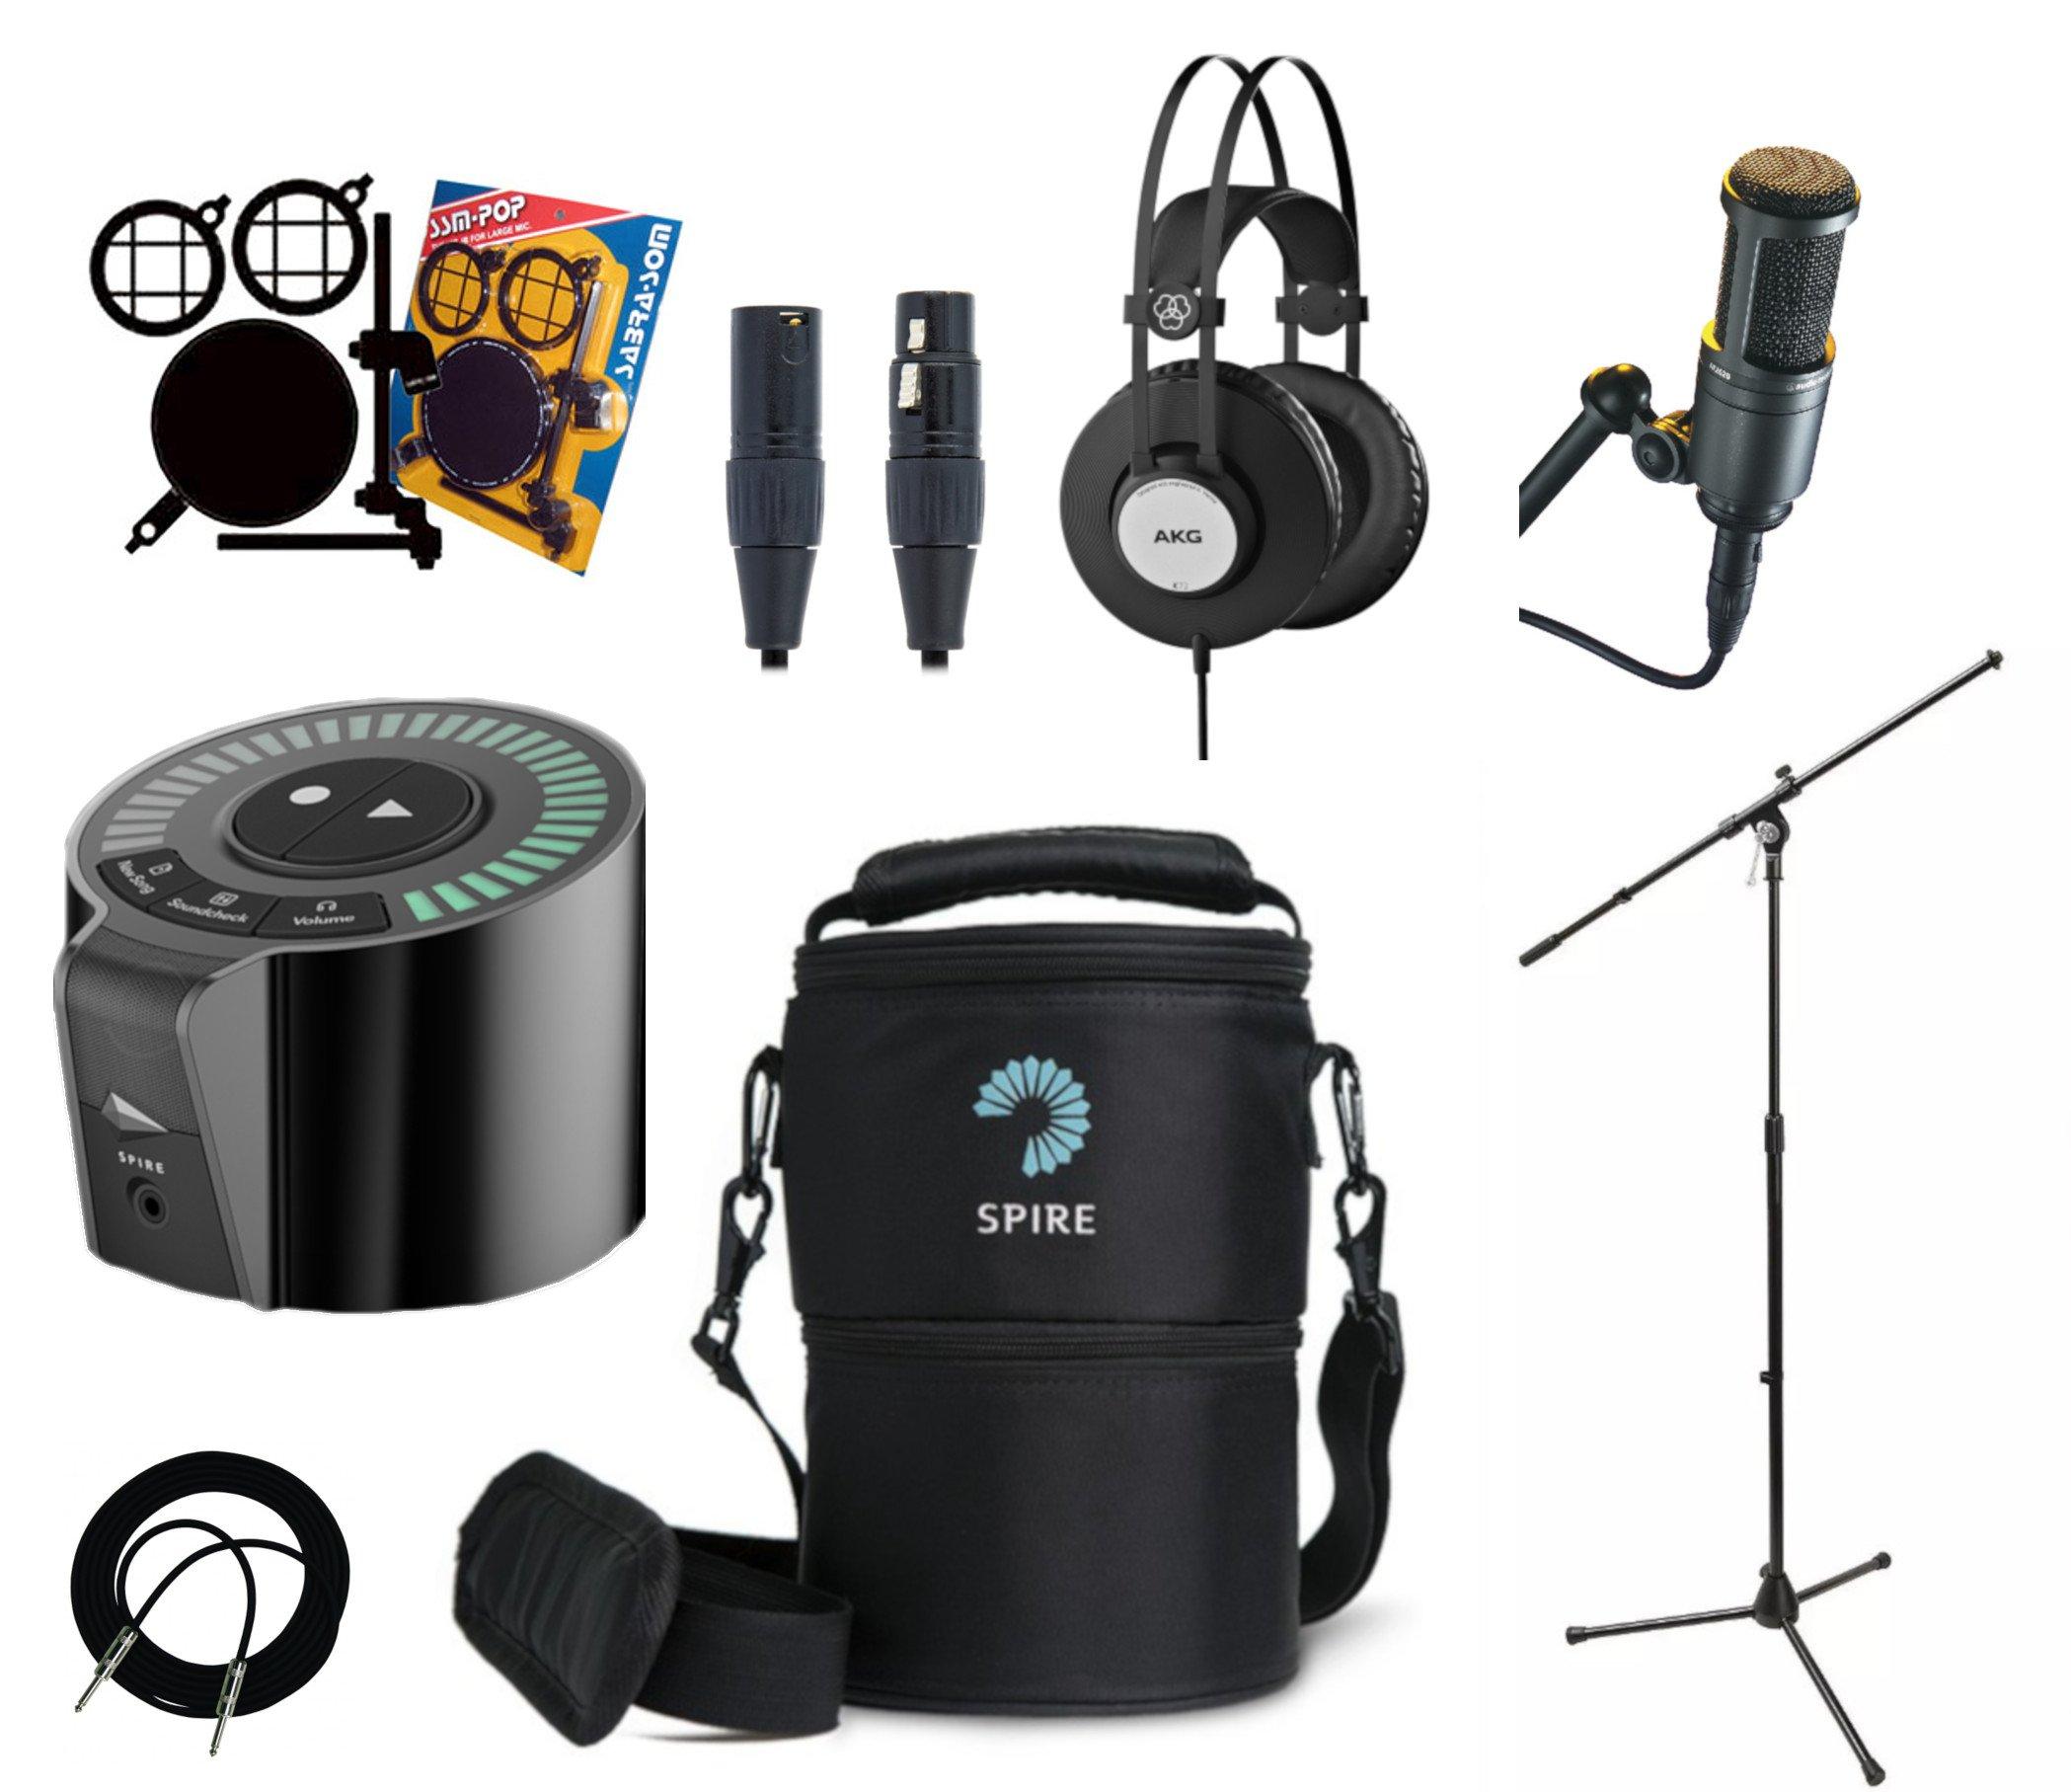 iZotope Spire Studio Recording Bundle Includes Spire Studio, Travel Bag,  Micrphone, Headphones, Cables & Stand | Full Compass